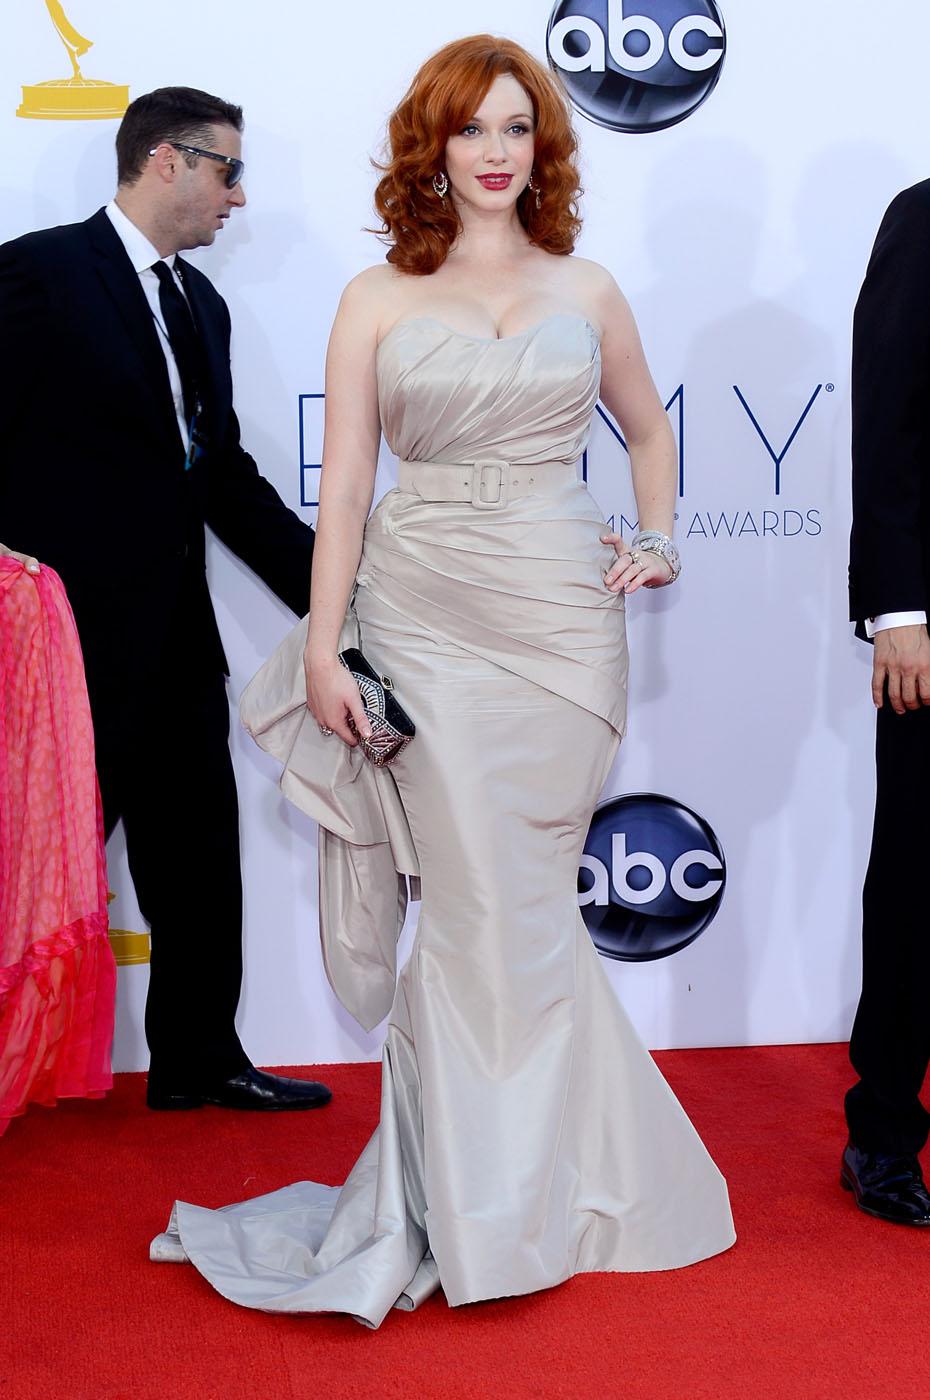 Christina Hendriks - 2012 Emmy Awards, Red Carpet Looks